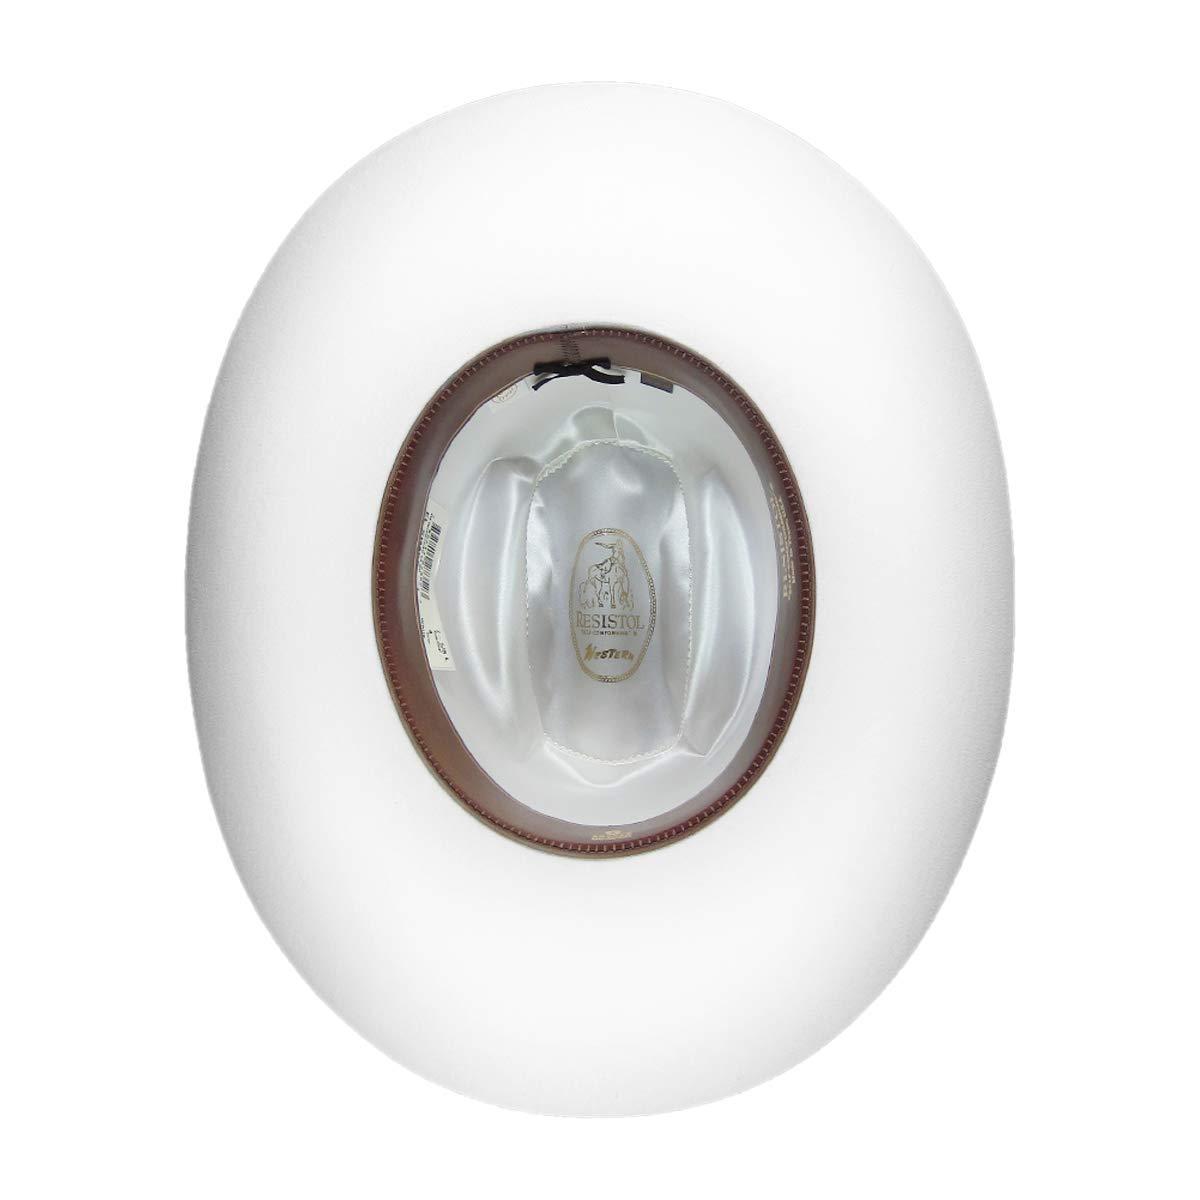 Resistol El Simbolo White Cattleman Cowboy Hat Size 7 5/8 Oval 4